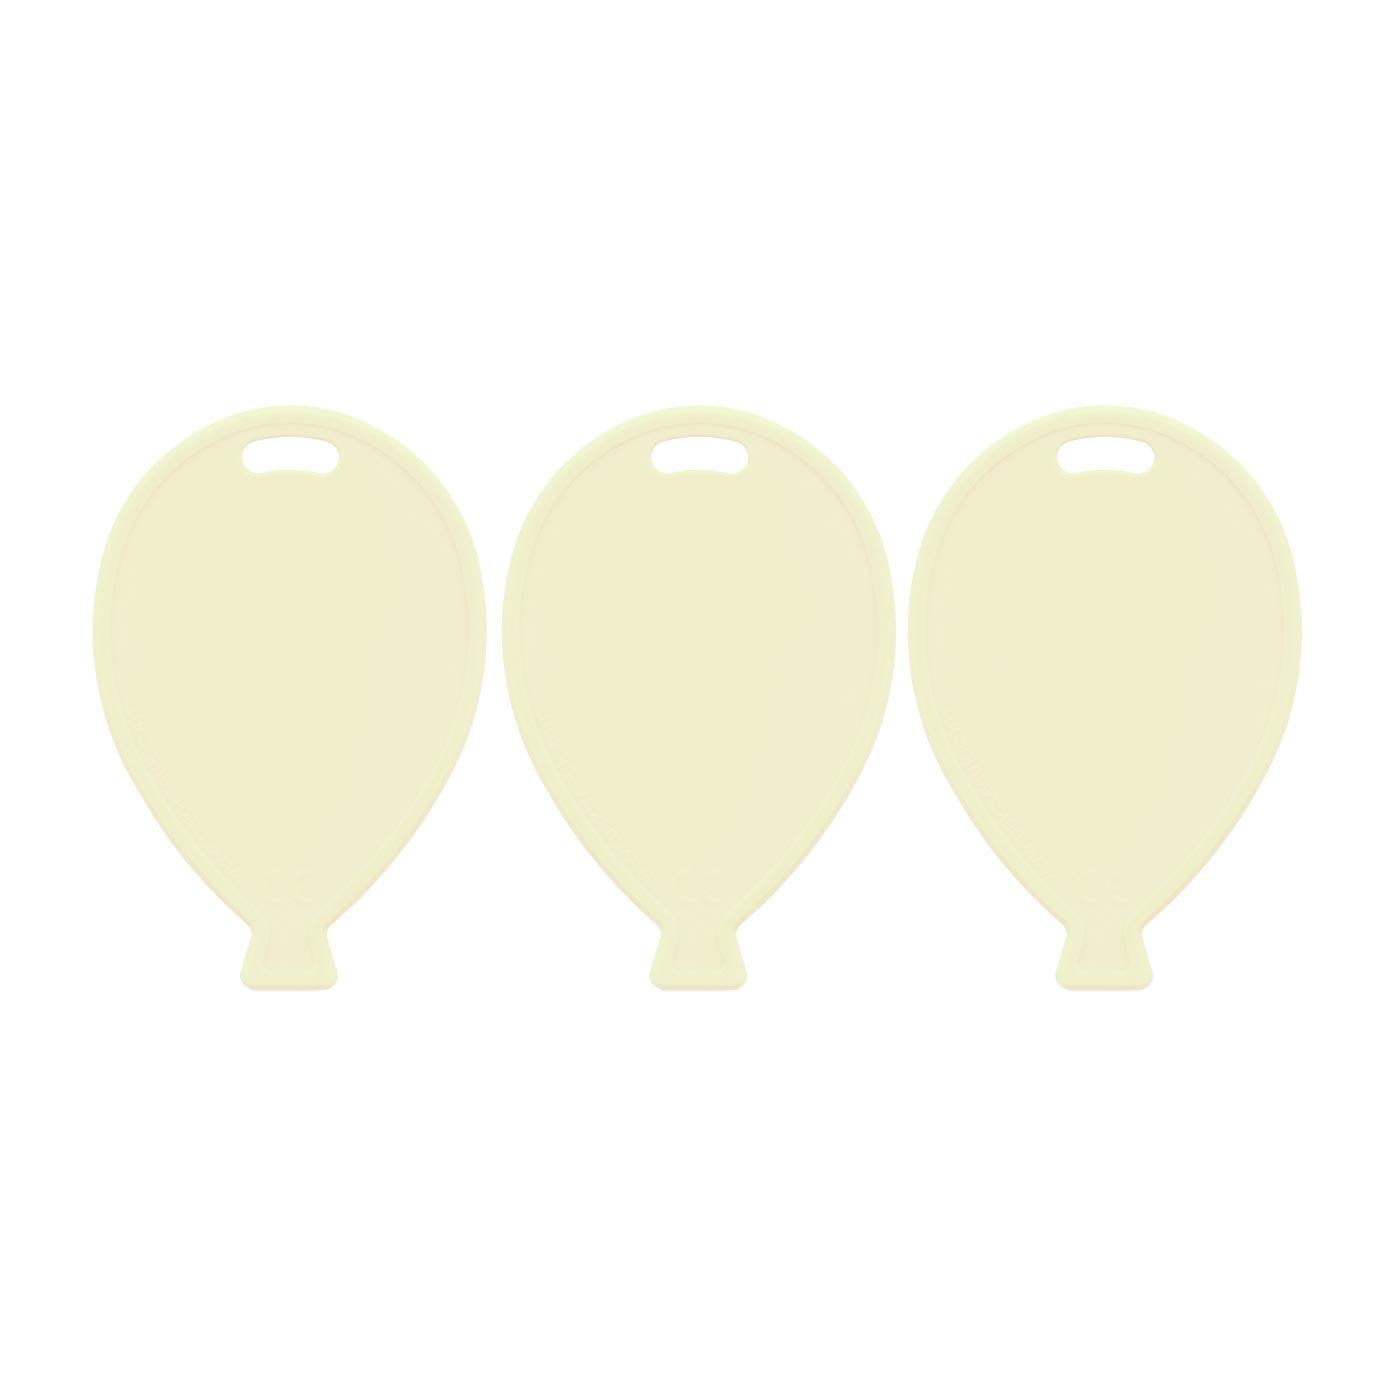 Ivory Balloon Weights